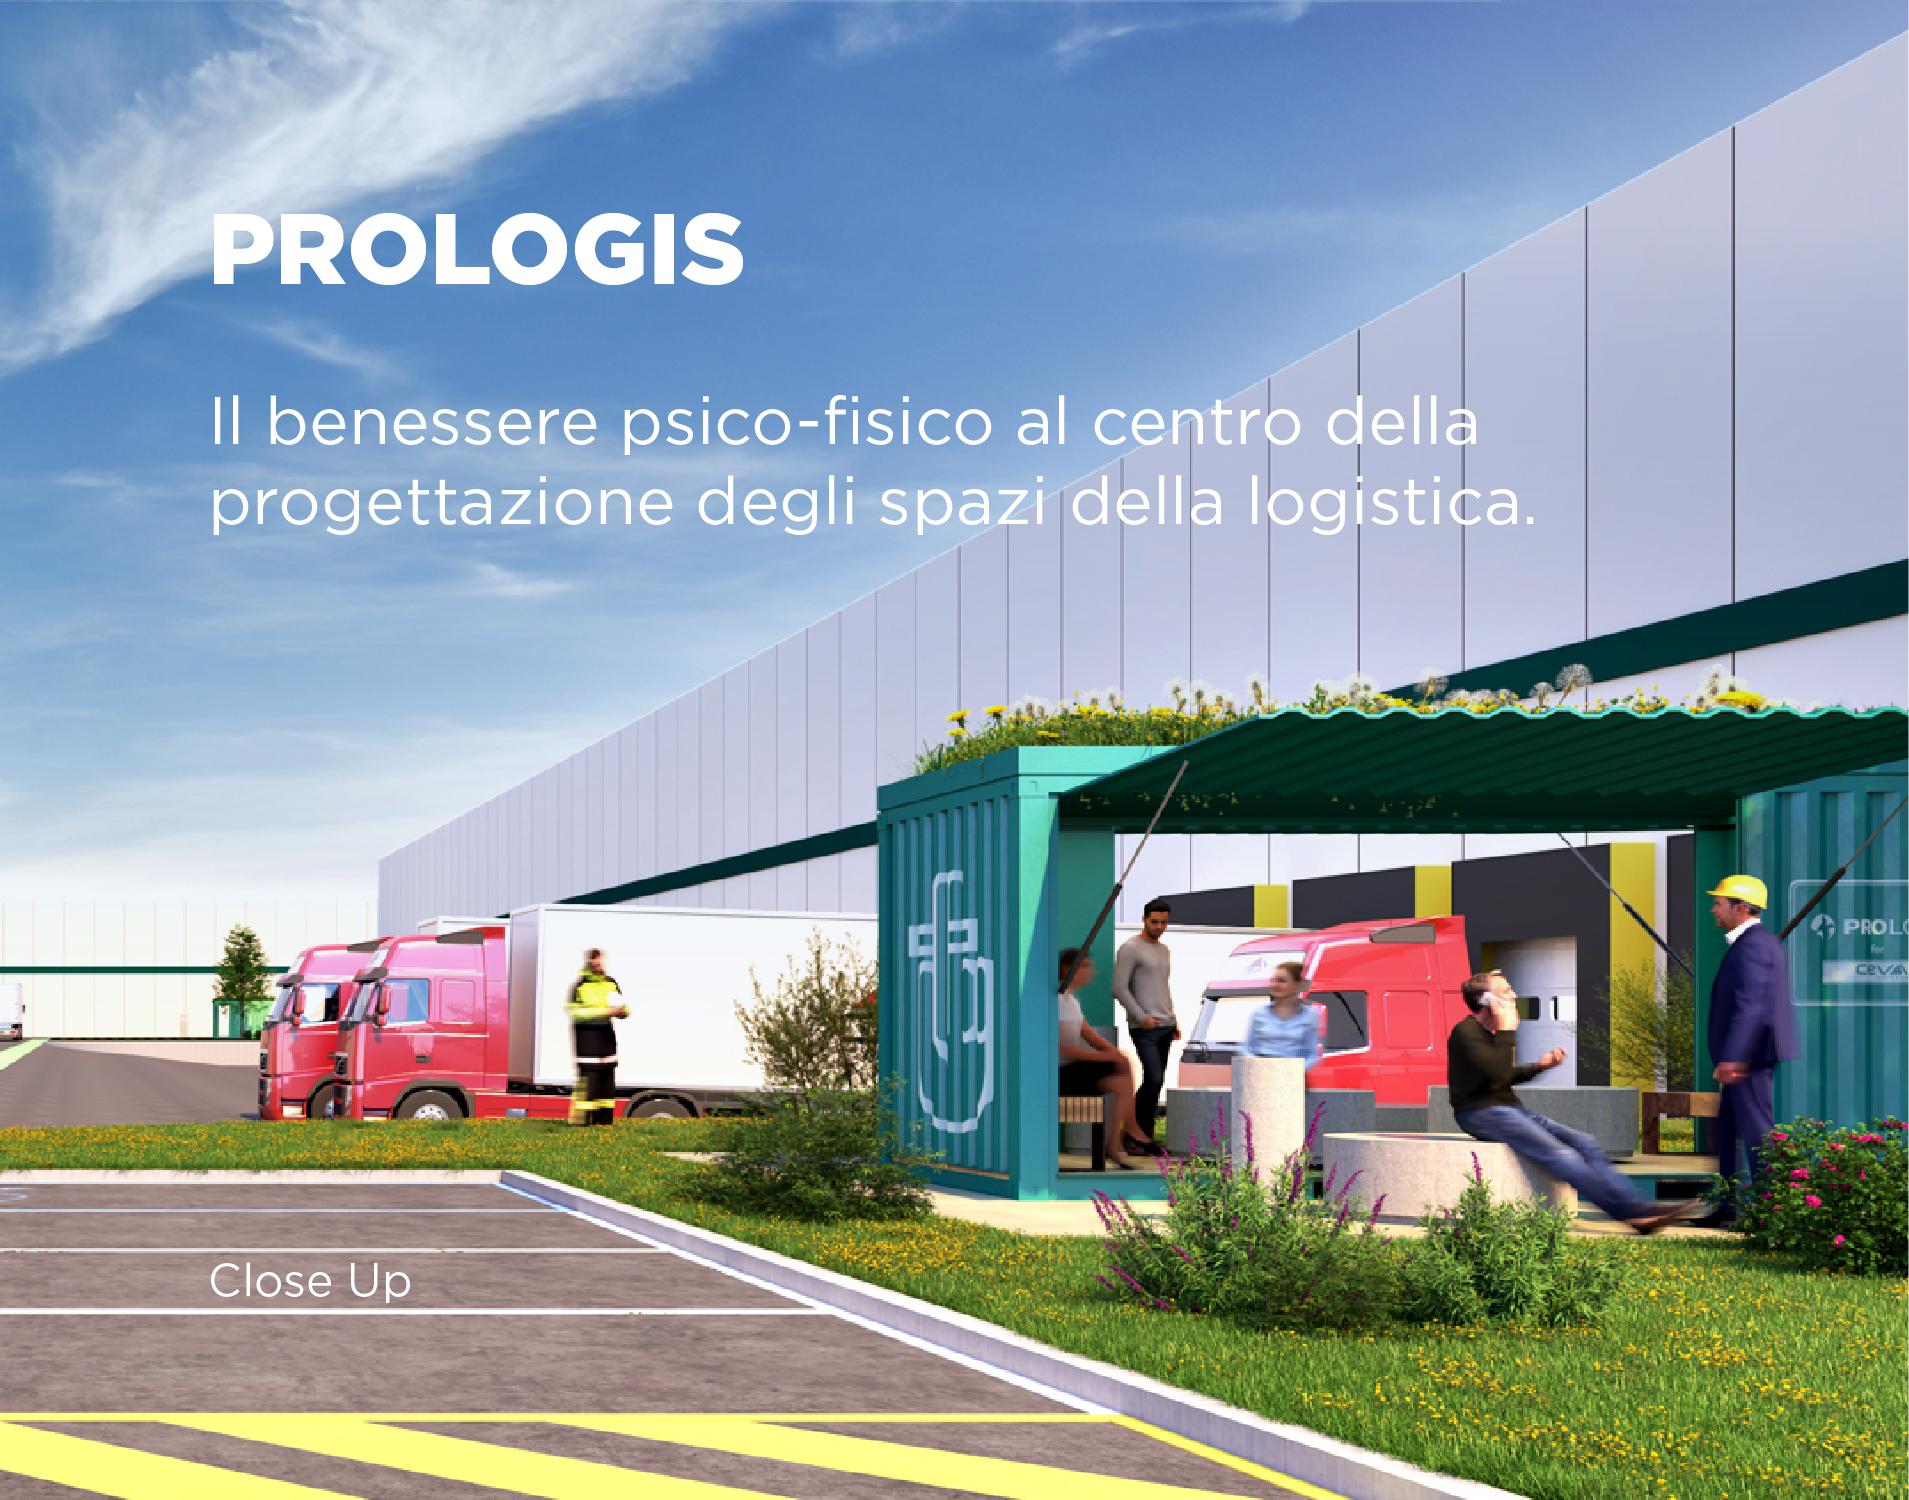 Prologis - Prologis ITA